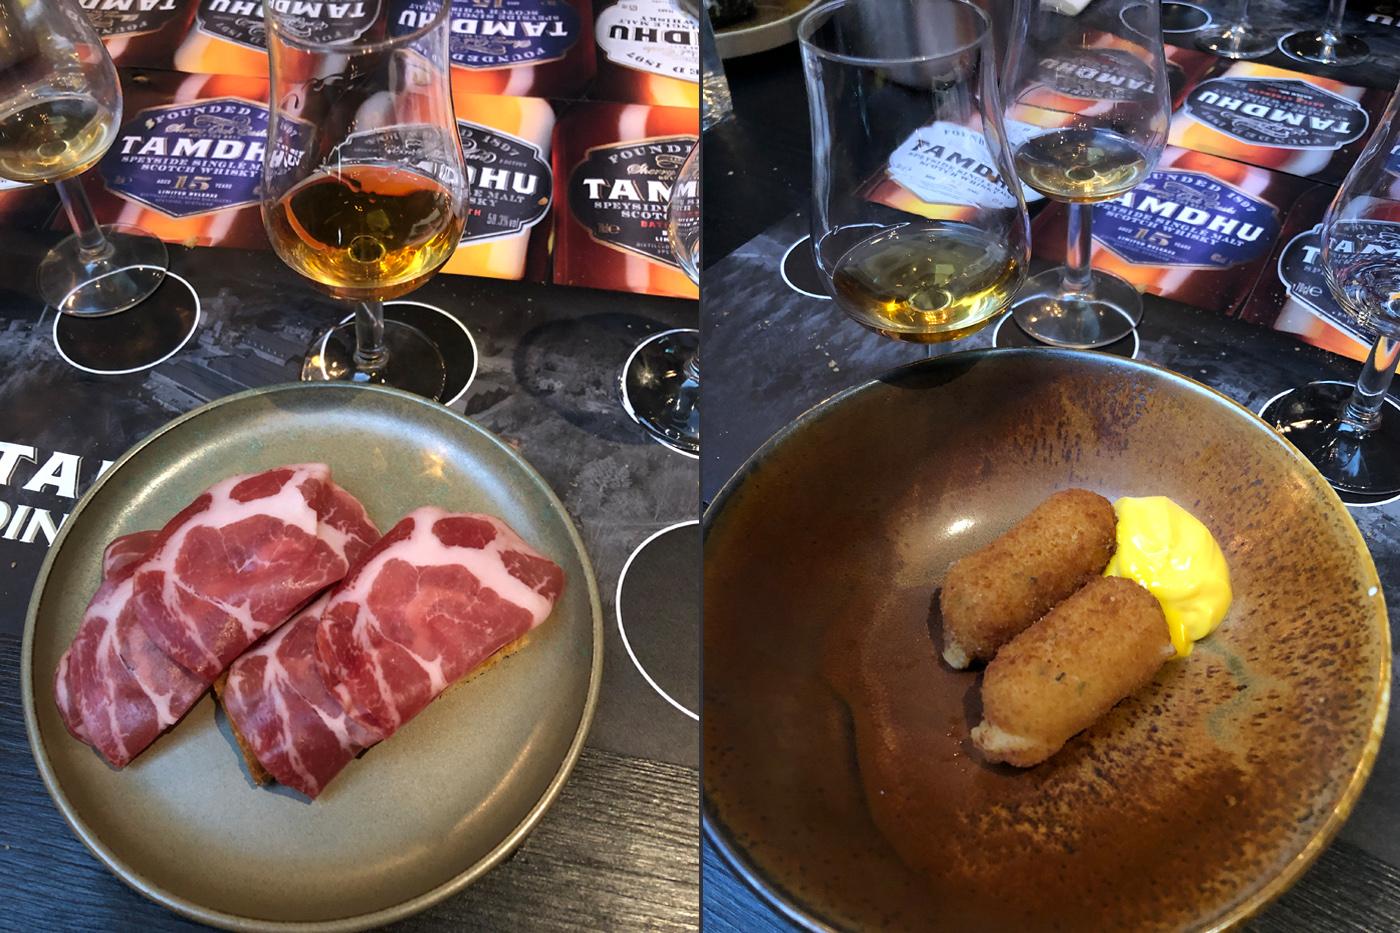 Tamdhu Whisky Diner 2019 groot succes_Tamdhu en Tapas